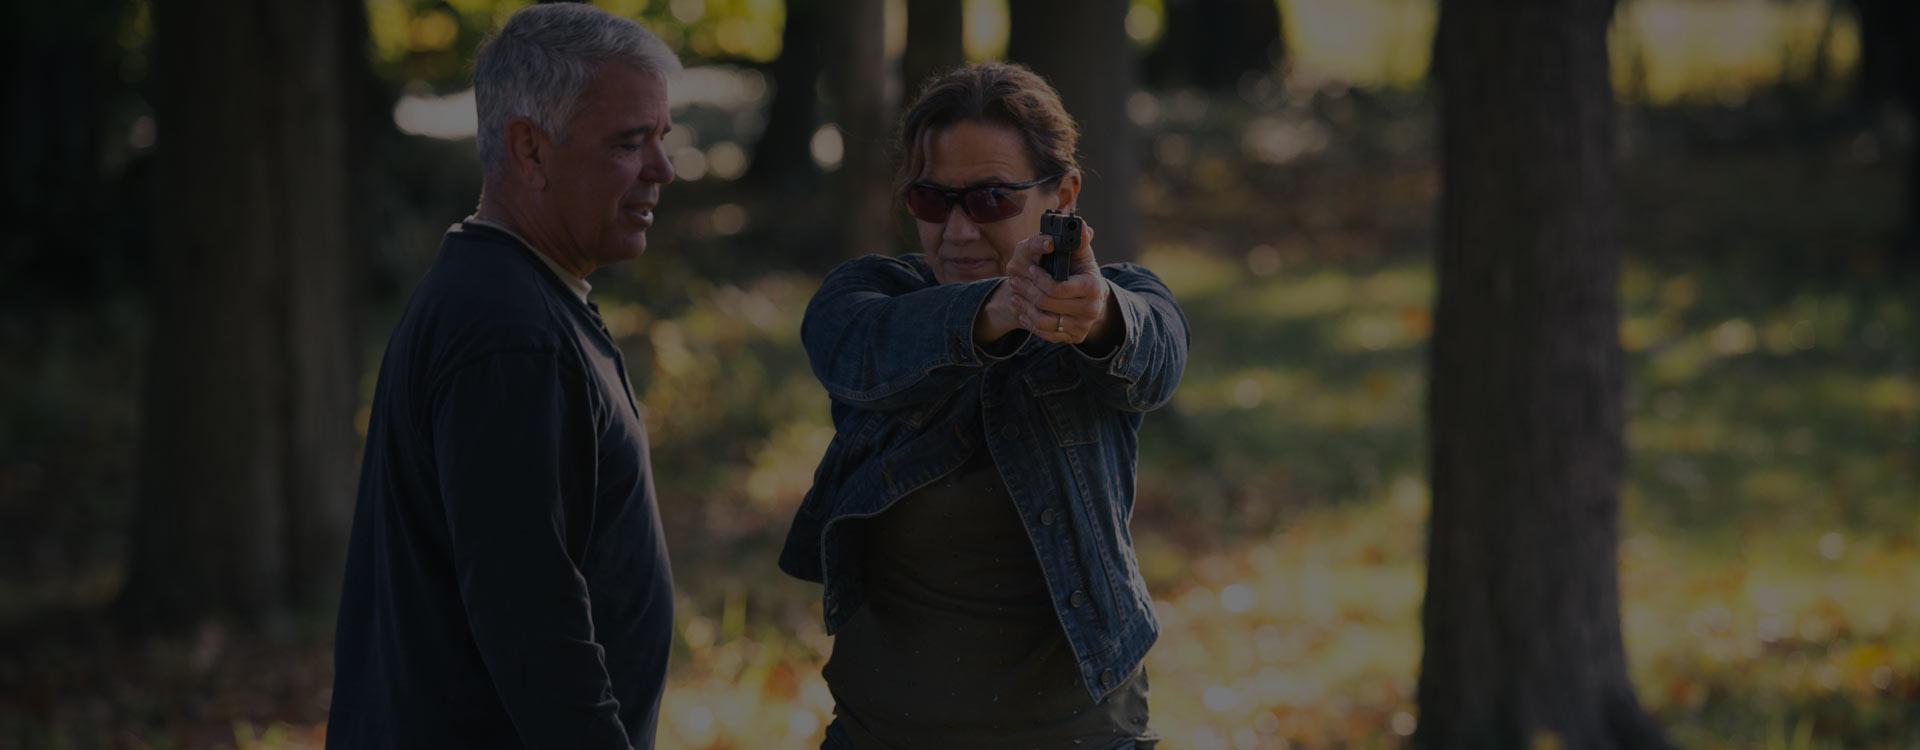 Citizens Defense Training - Mainline Firearm Training - Mainline Womens Firearm Training - Mainline NRA Firearm Training